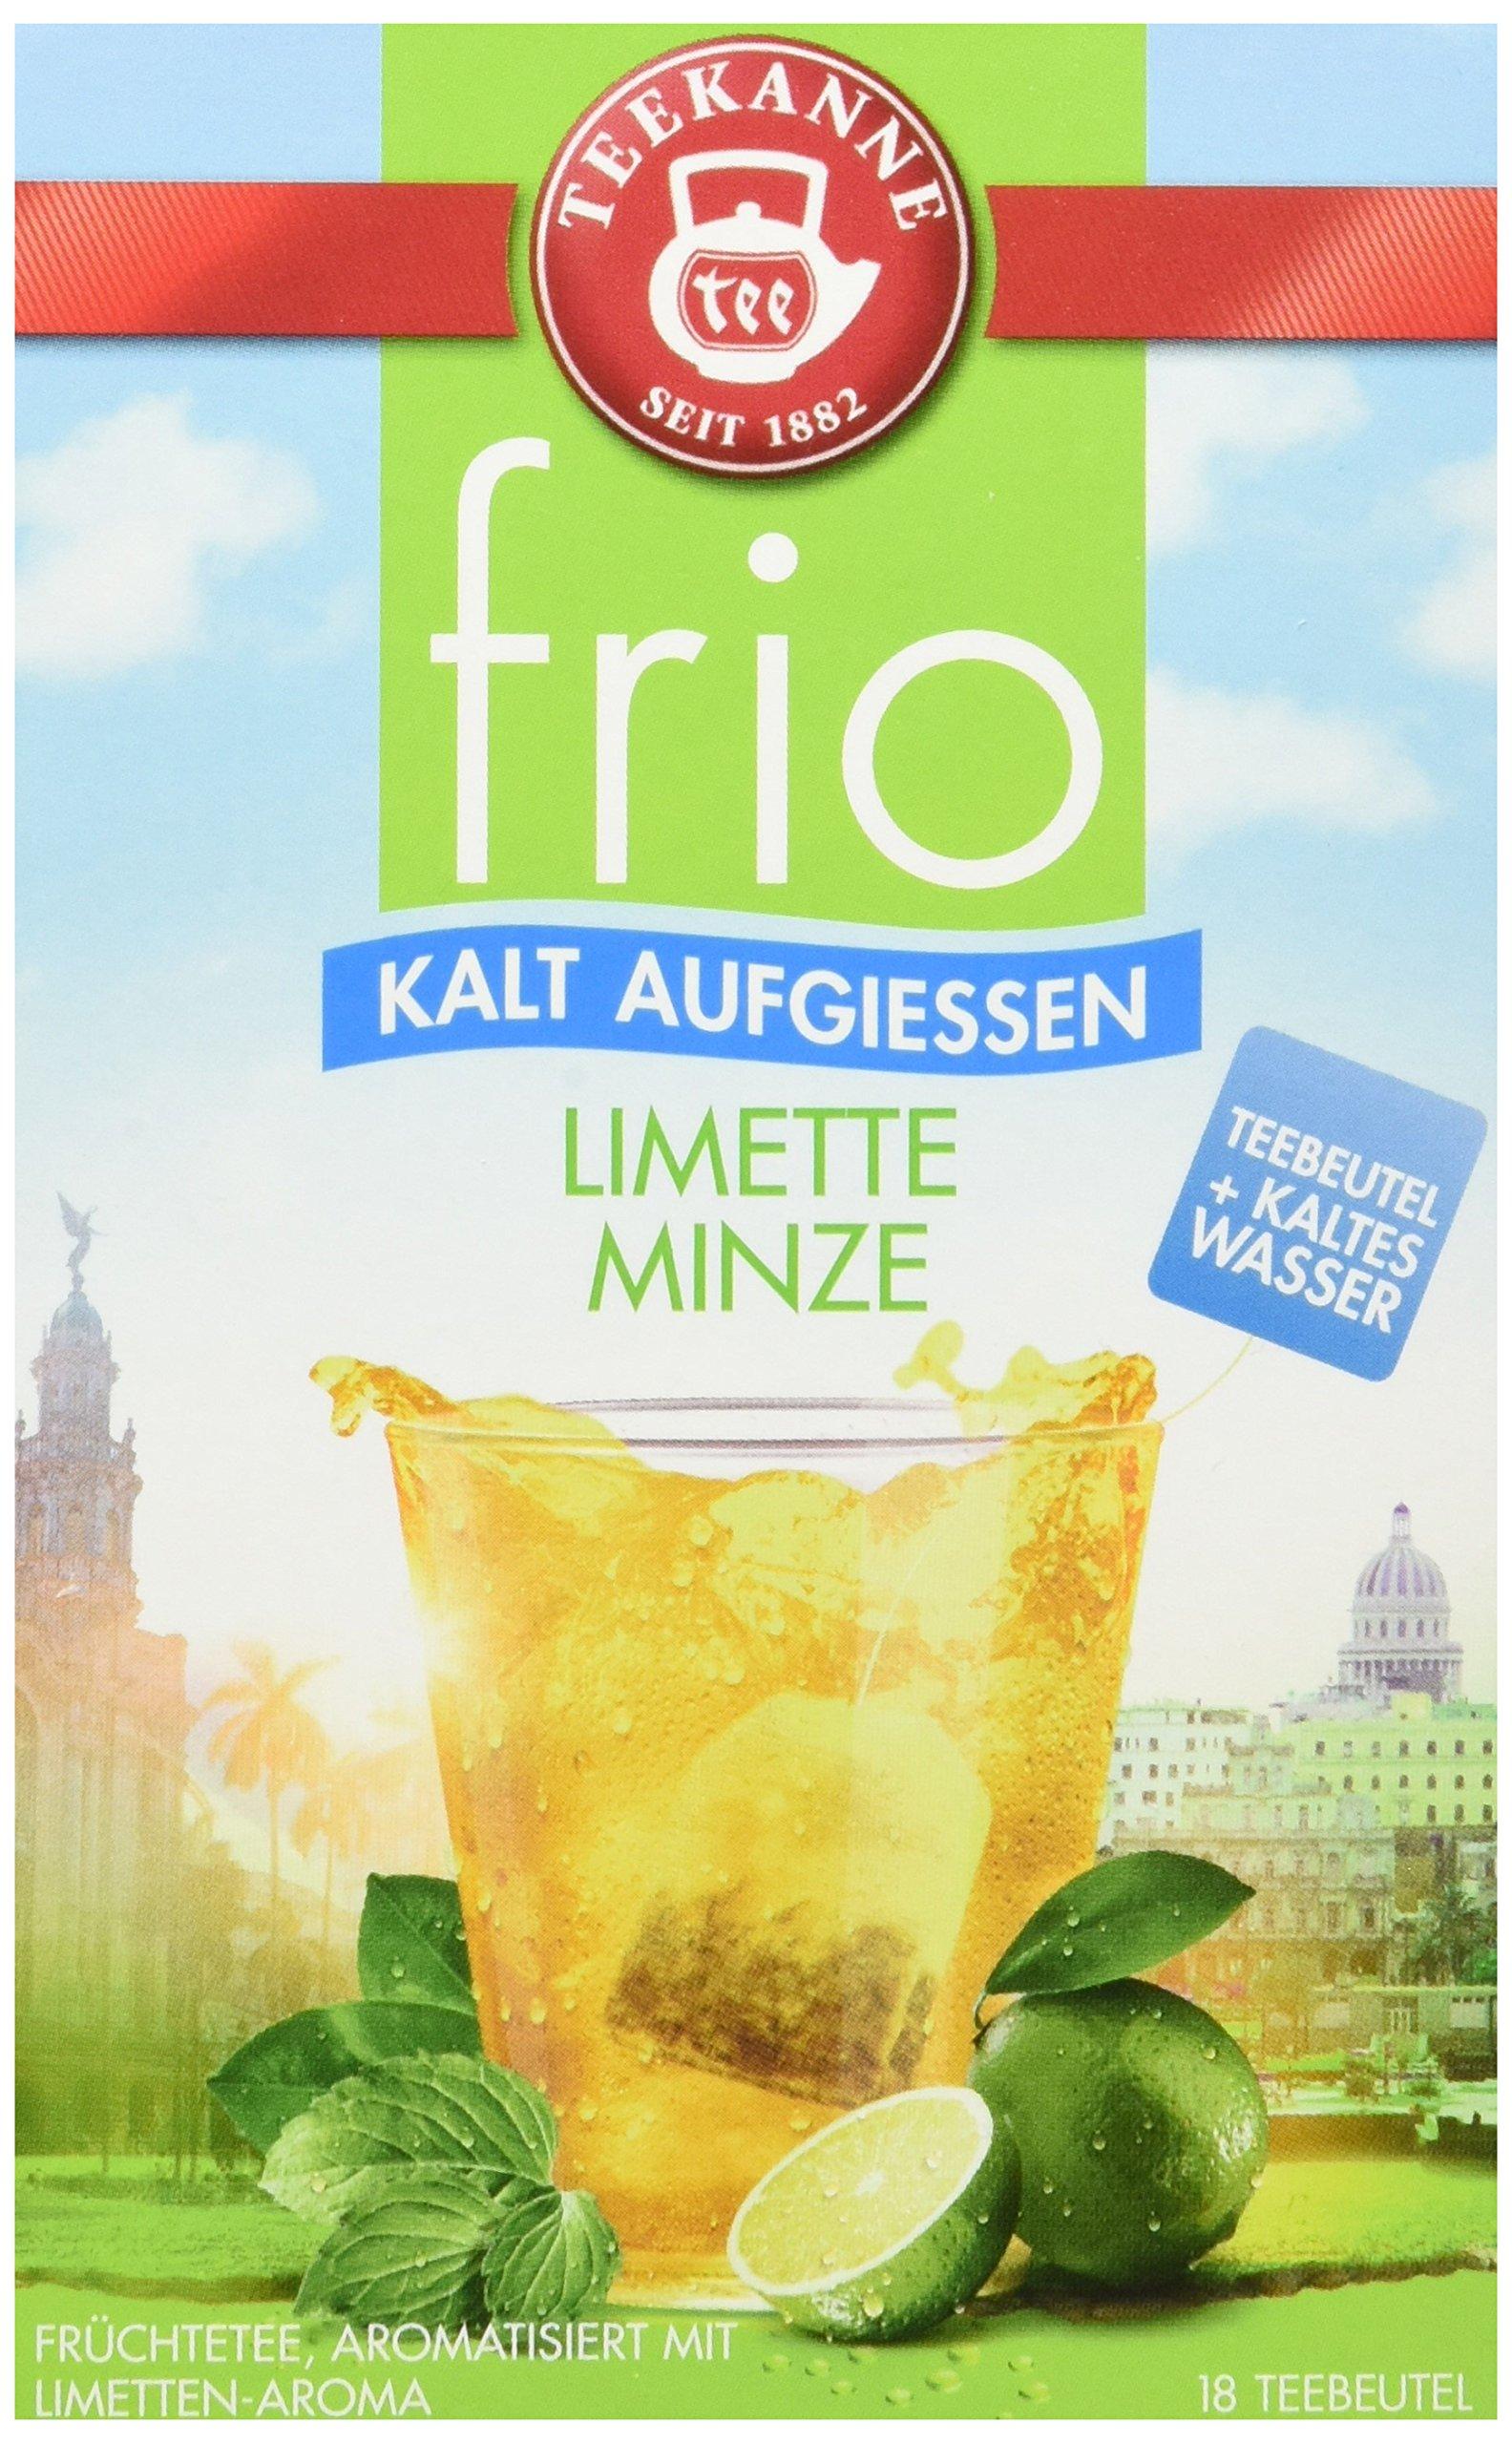 Teekanne-frio-Limette-Minze-5er-Pack-5-x-45-g